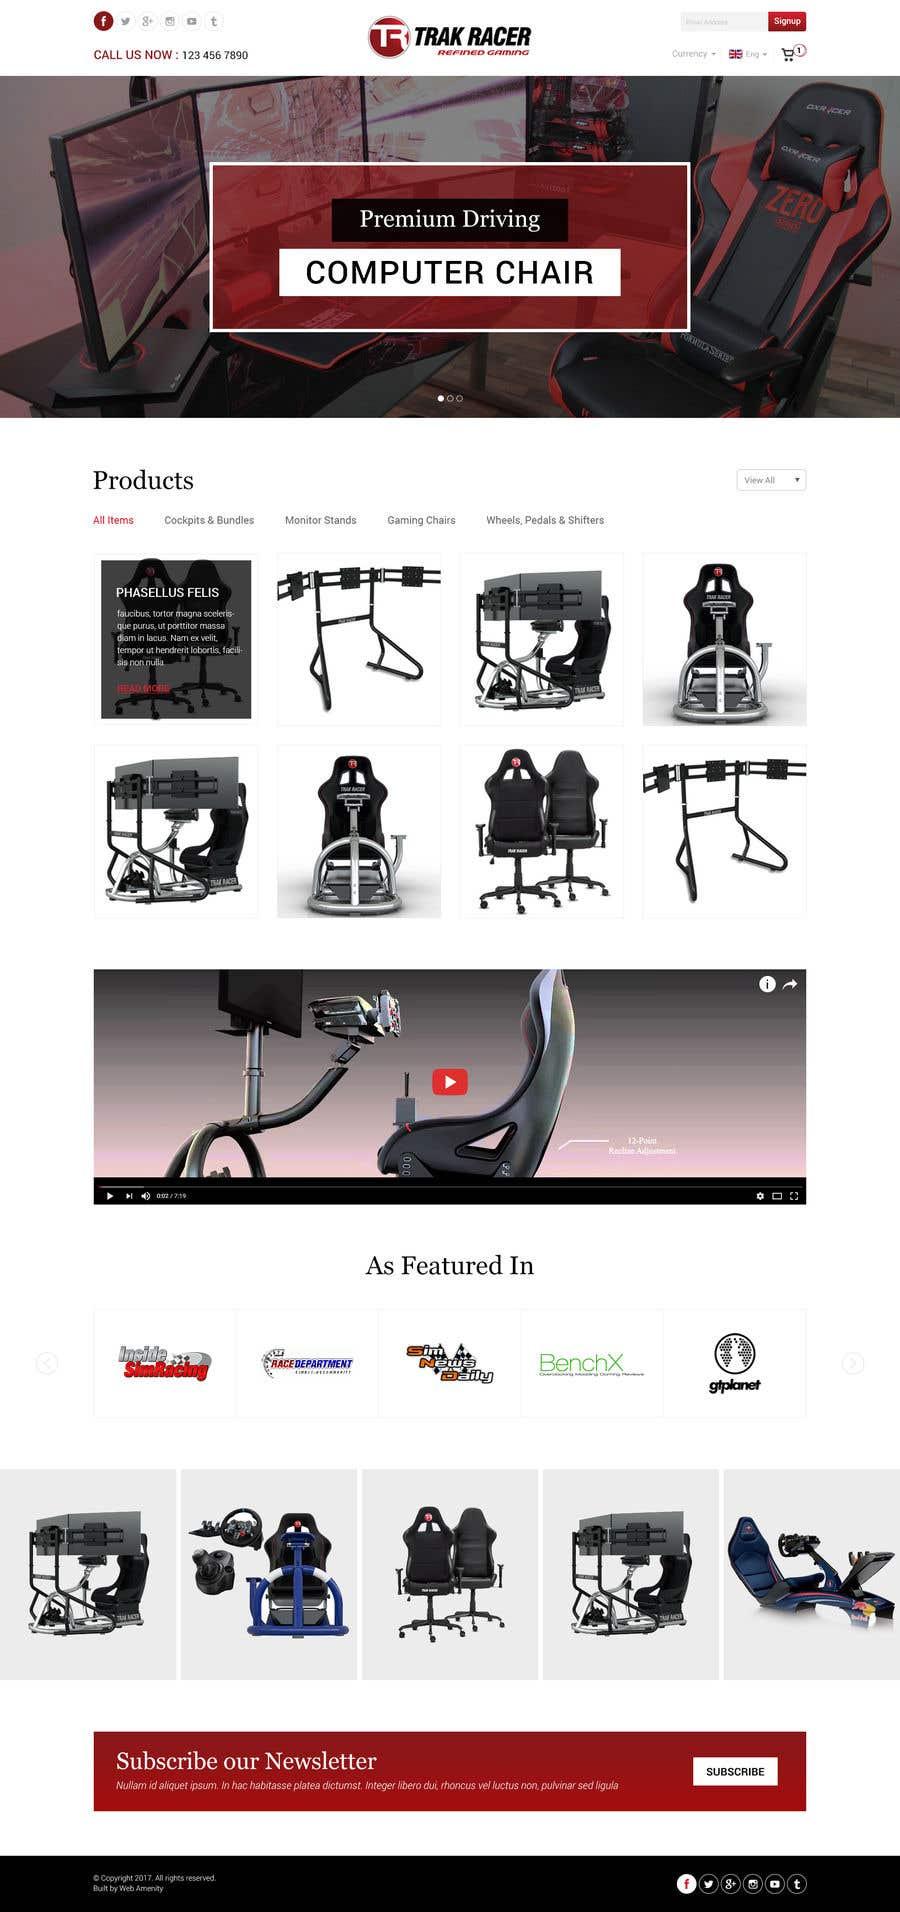 Penyertaan Peraduan #26 untuk Design a home page including header and footer